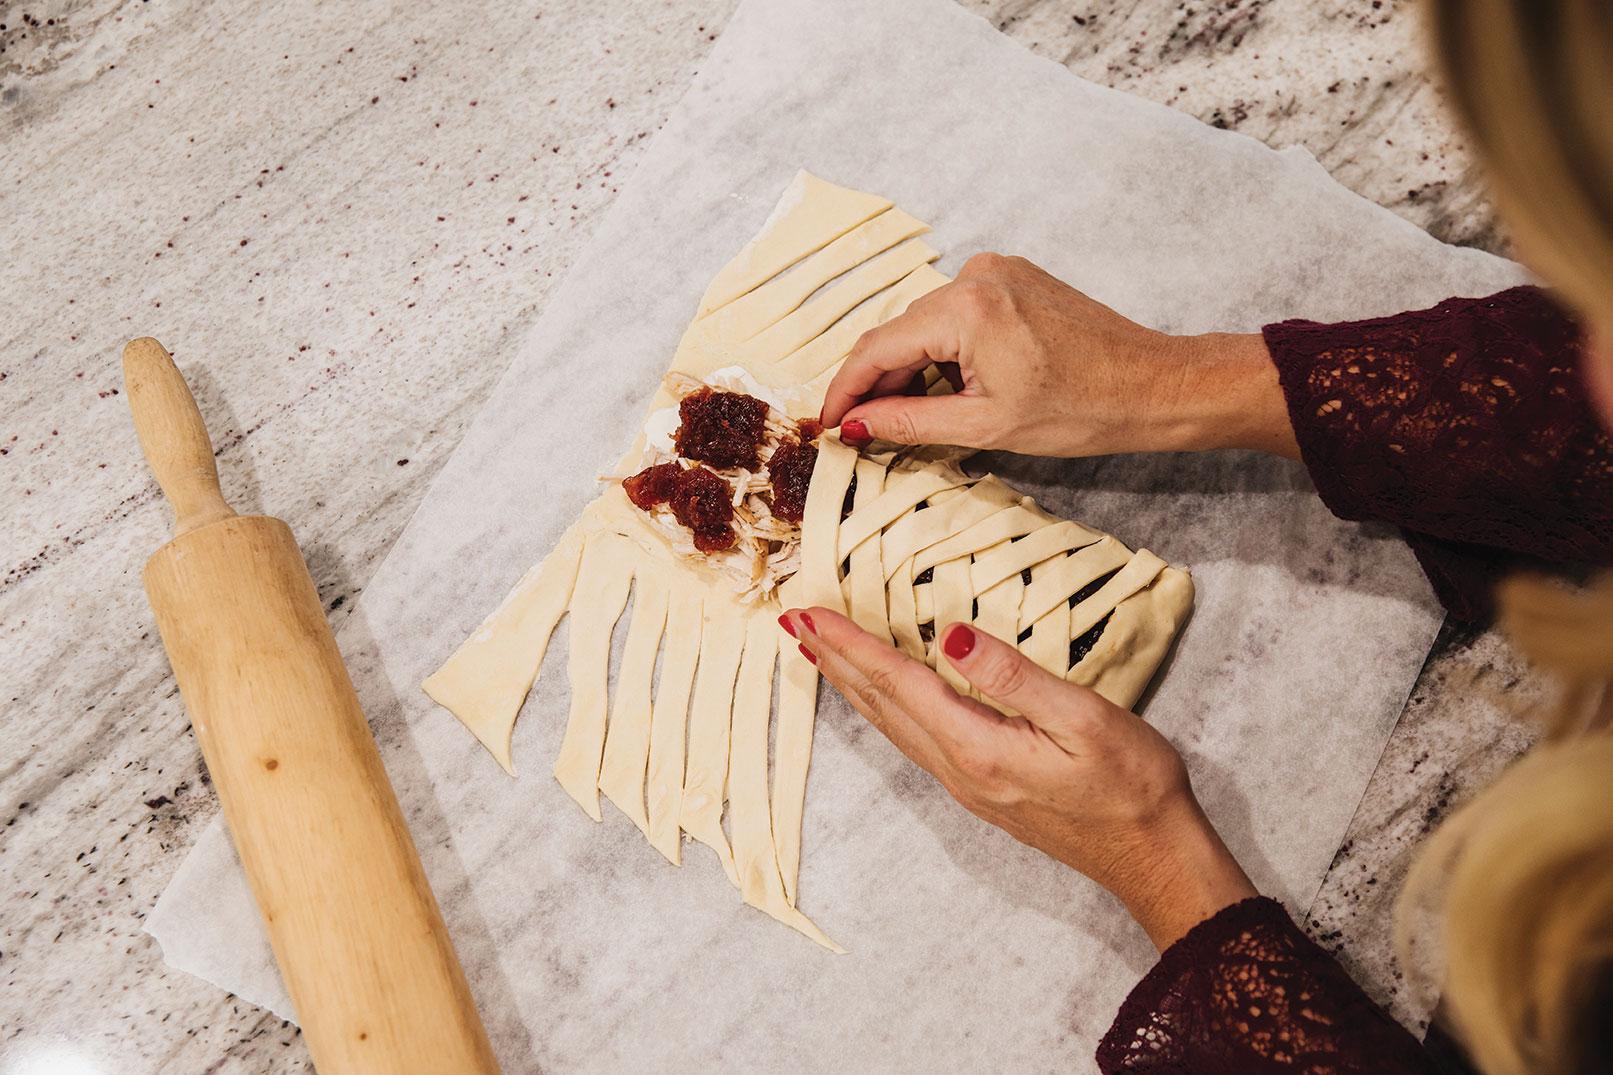 Crisscross the dough over the filling